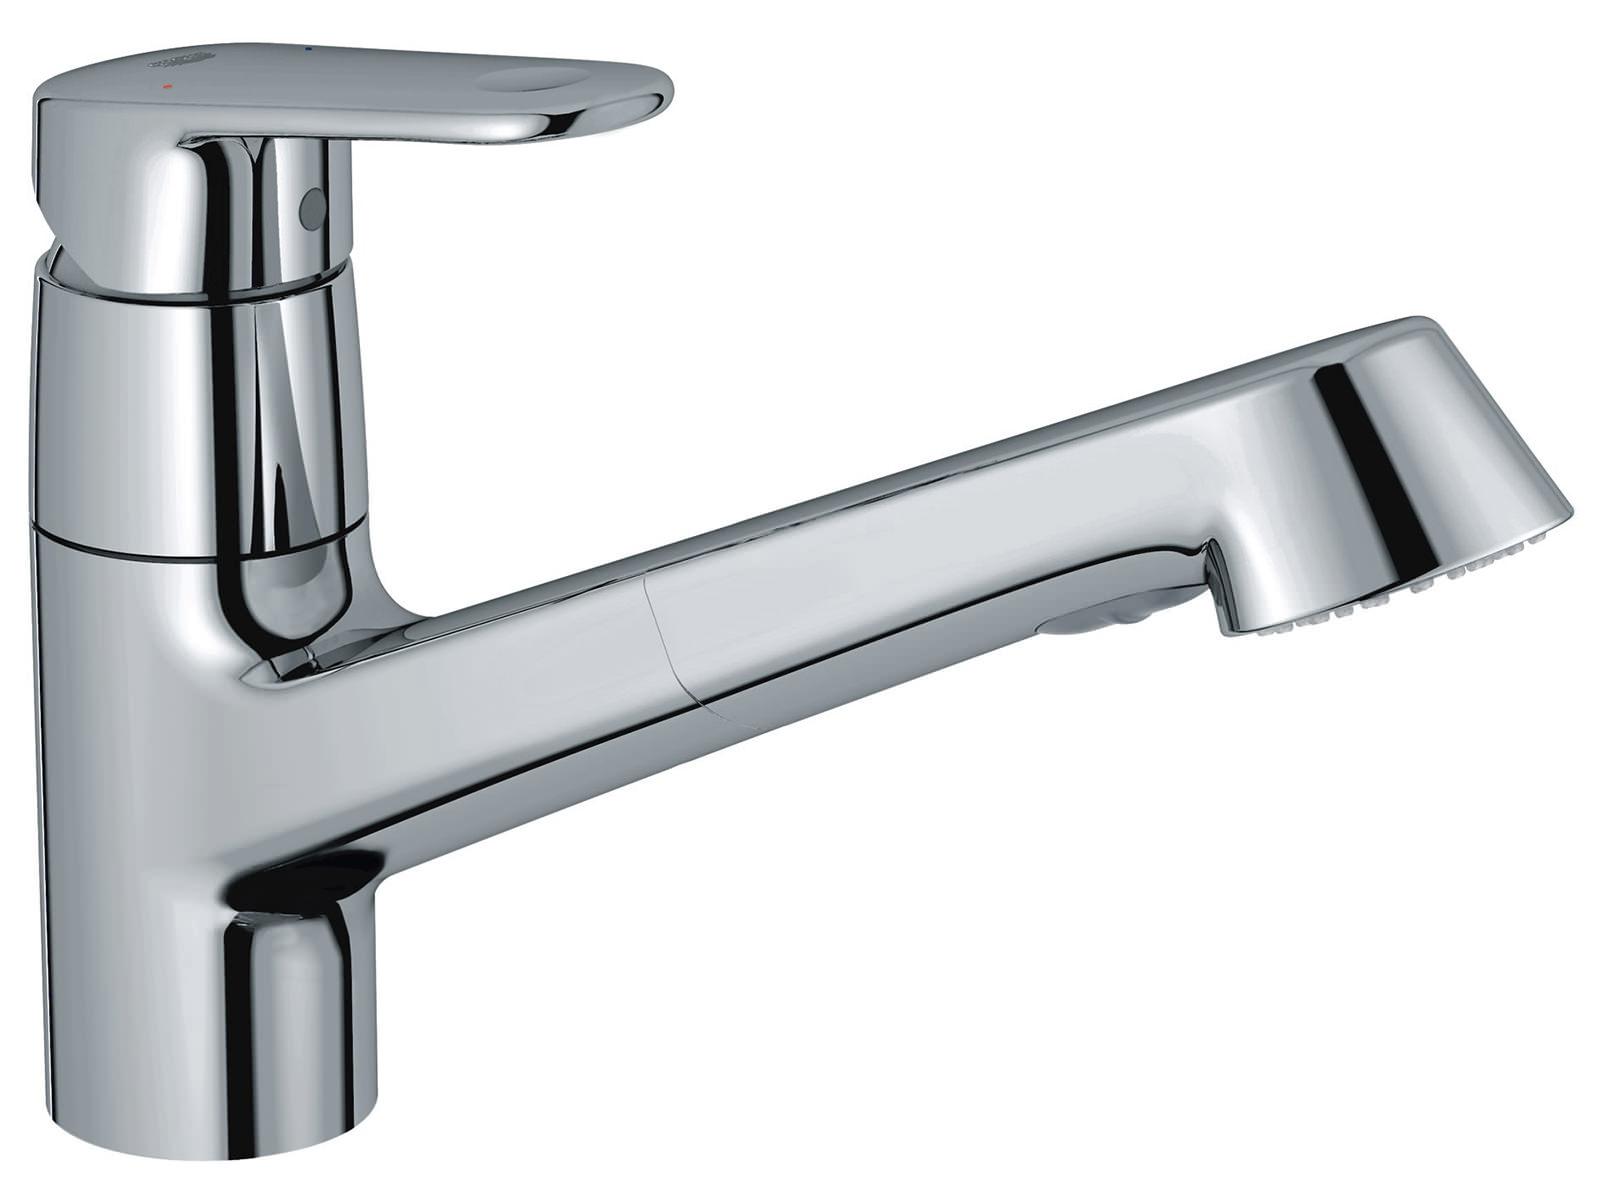 Grohe Europlus Chrome Low Spout Sink Mixer Tap 32942002